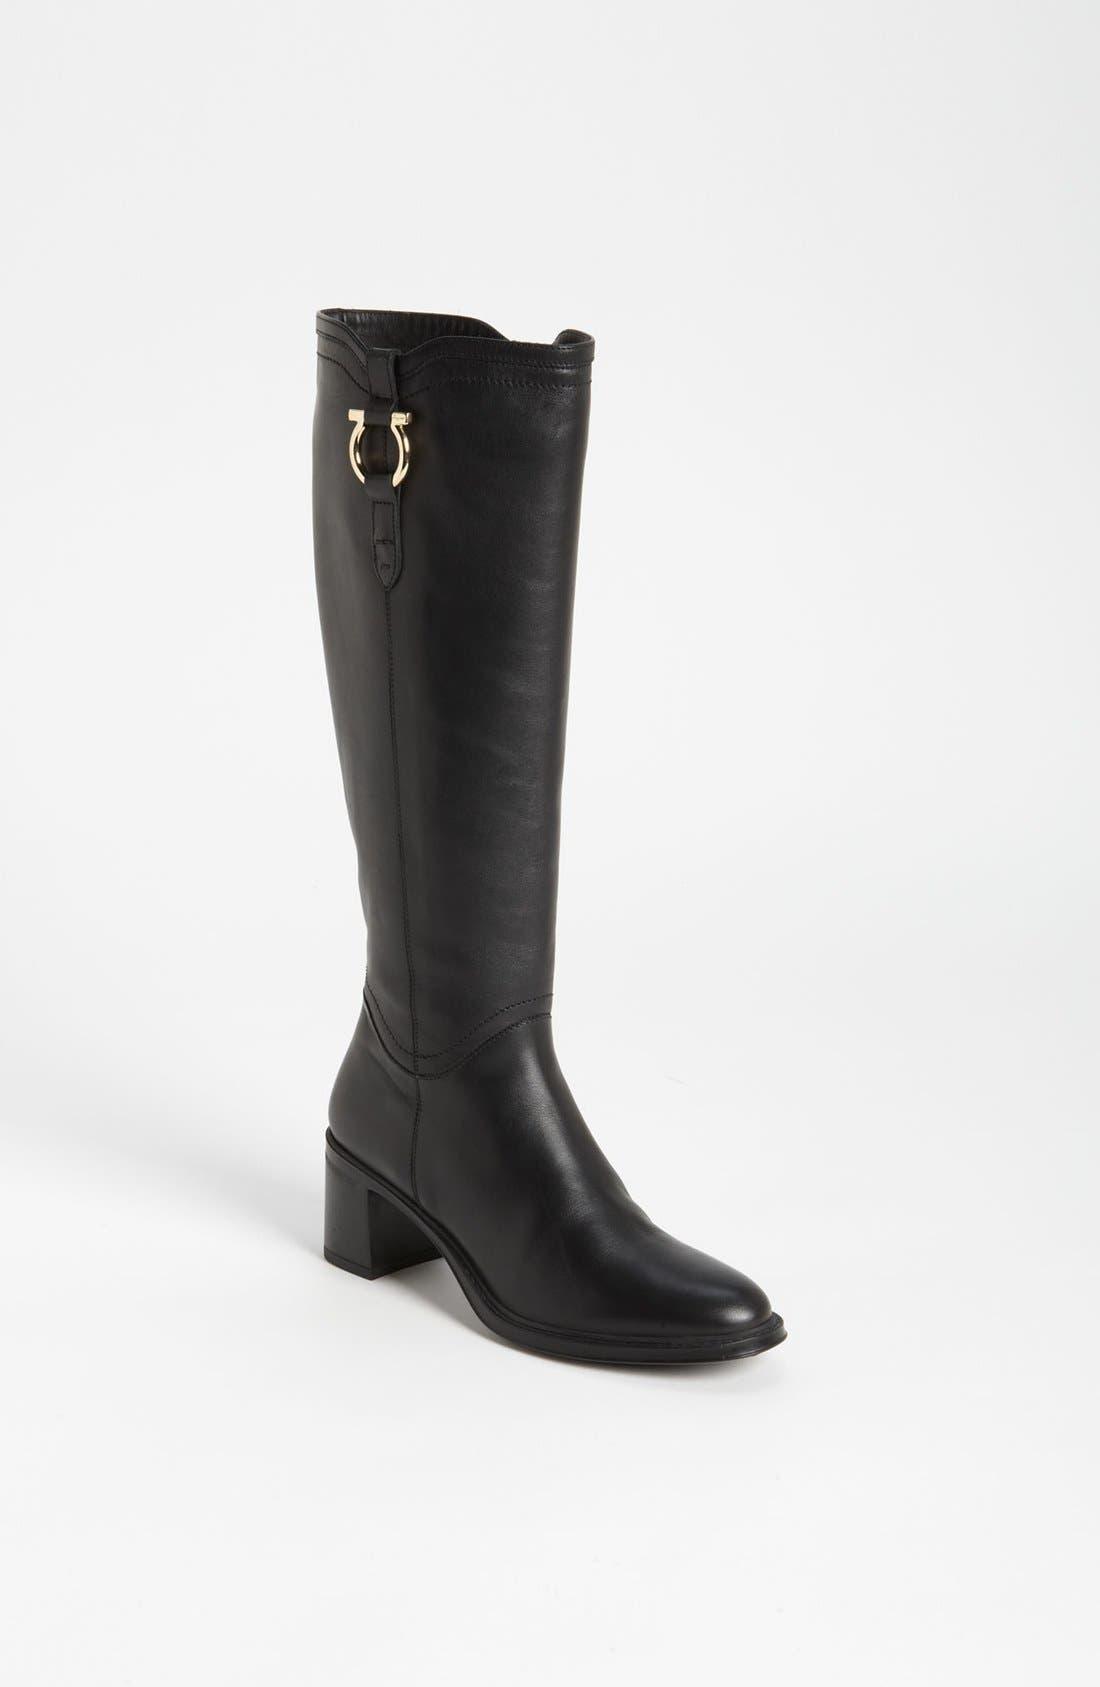 Main Image - Salvatore Ferragamo 'Fersea' Leather Boot